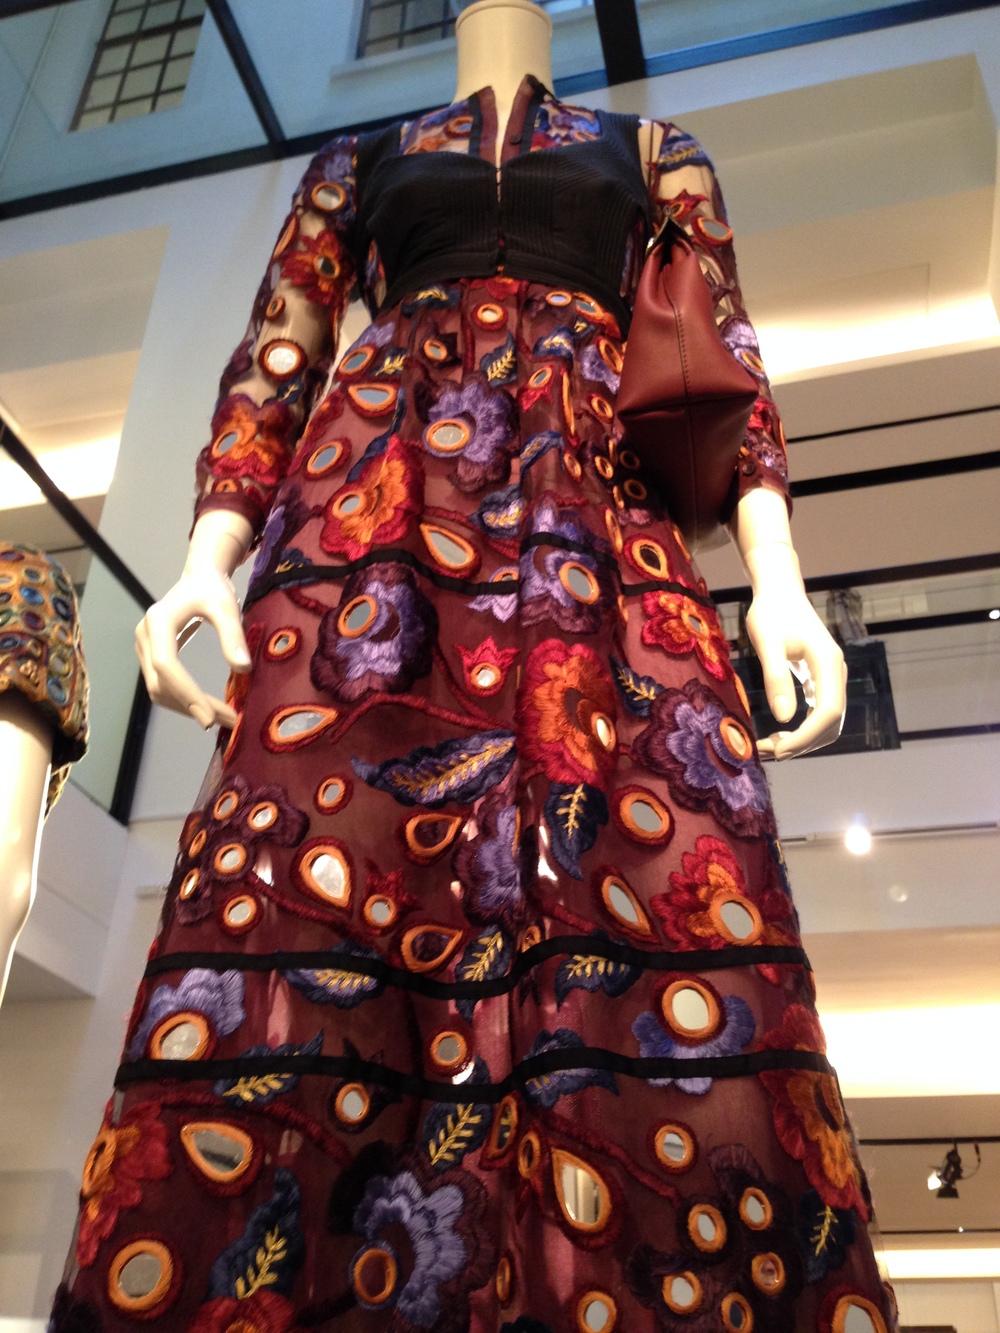 Statement Mirrored dress,Burberry Prorsum Autumn Winter Womenswear 2015